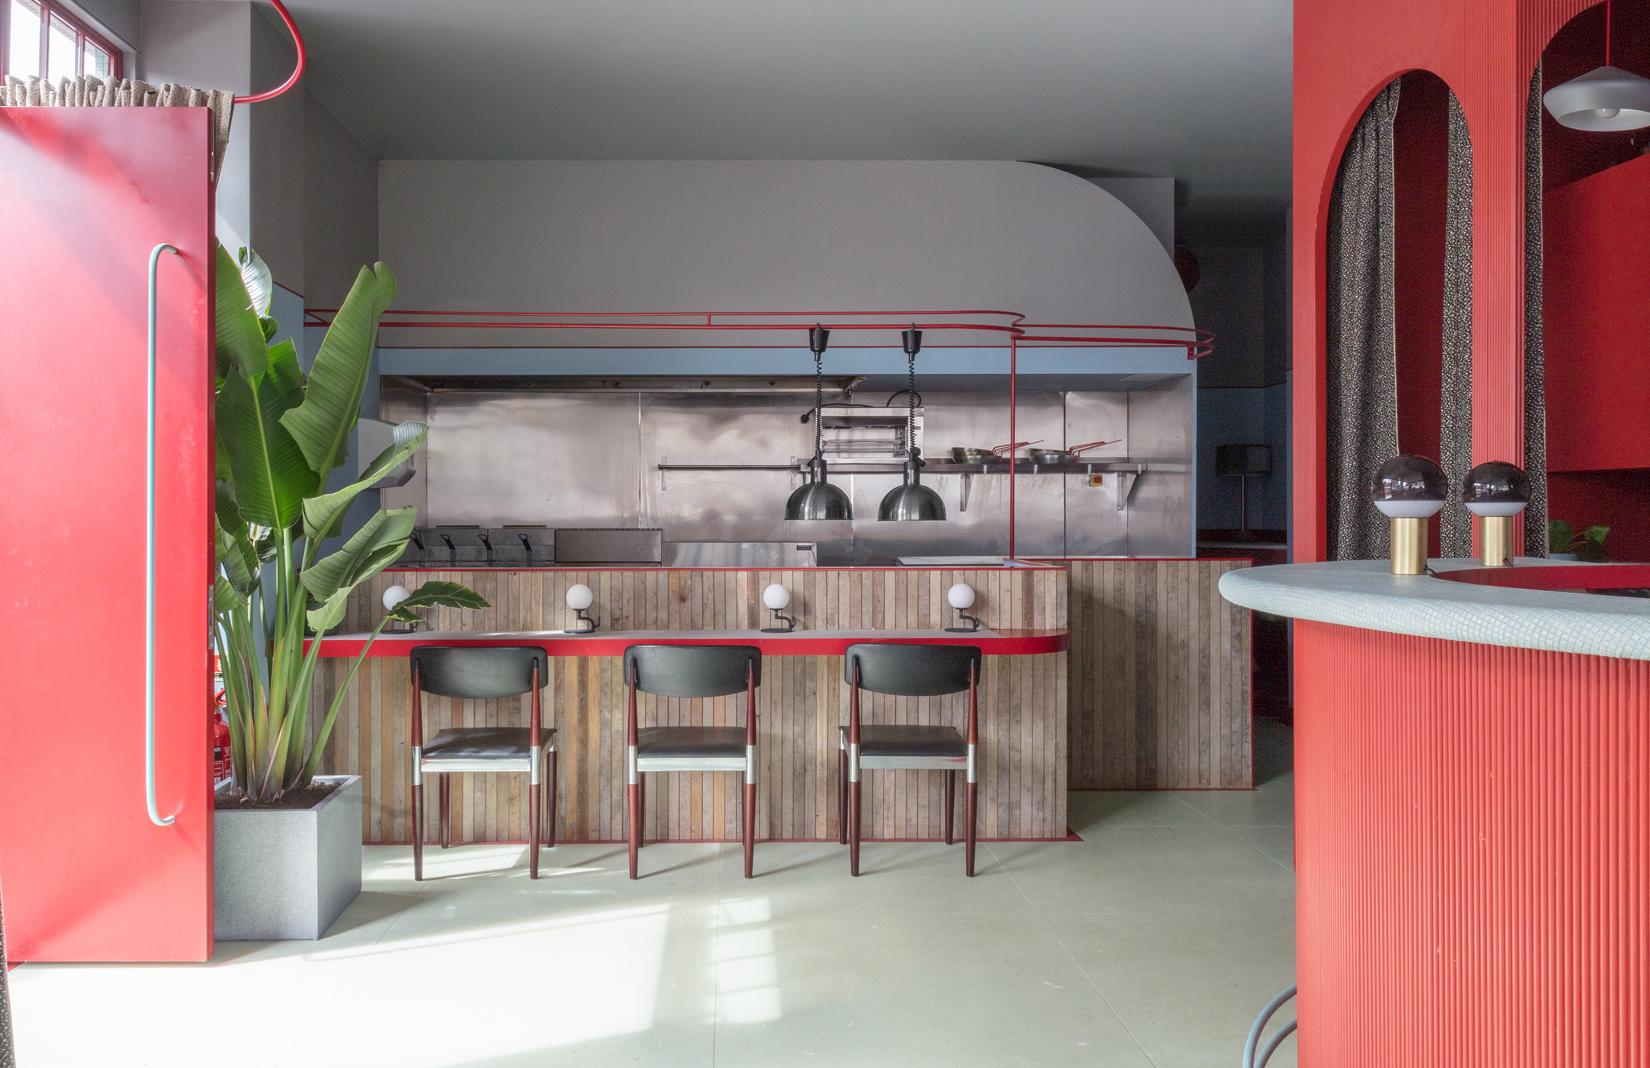 New London restaurants to visit this autumn -- Pirana